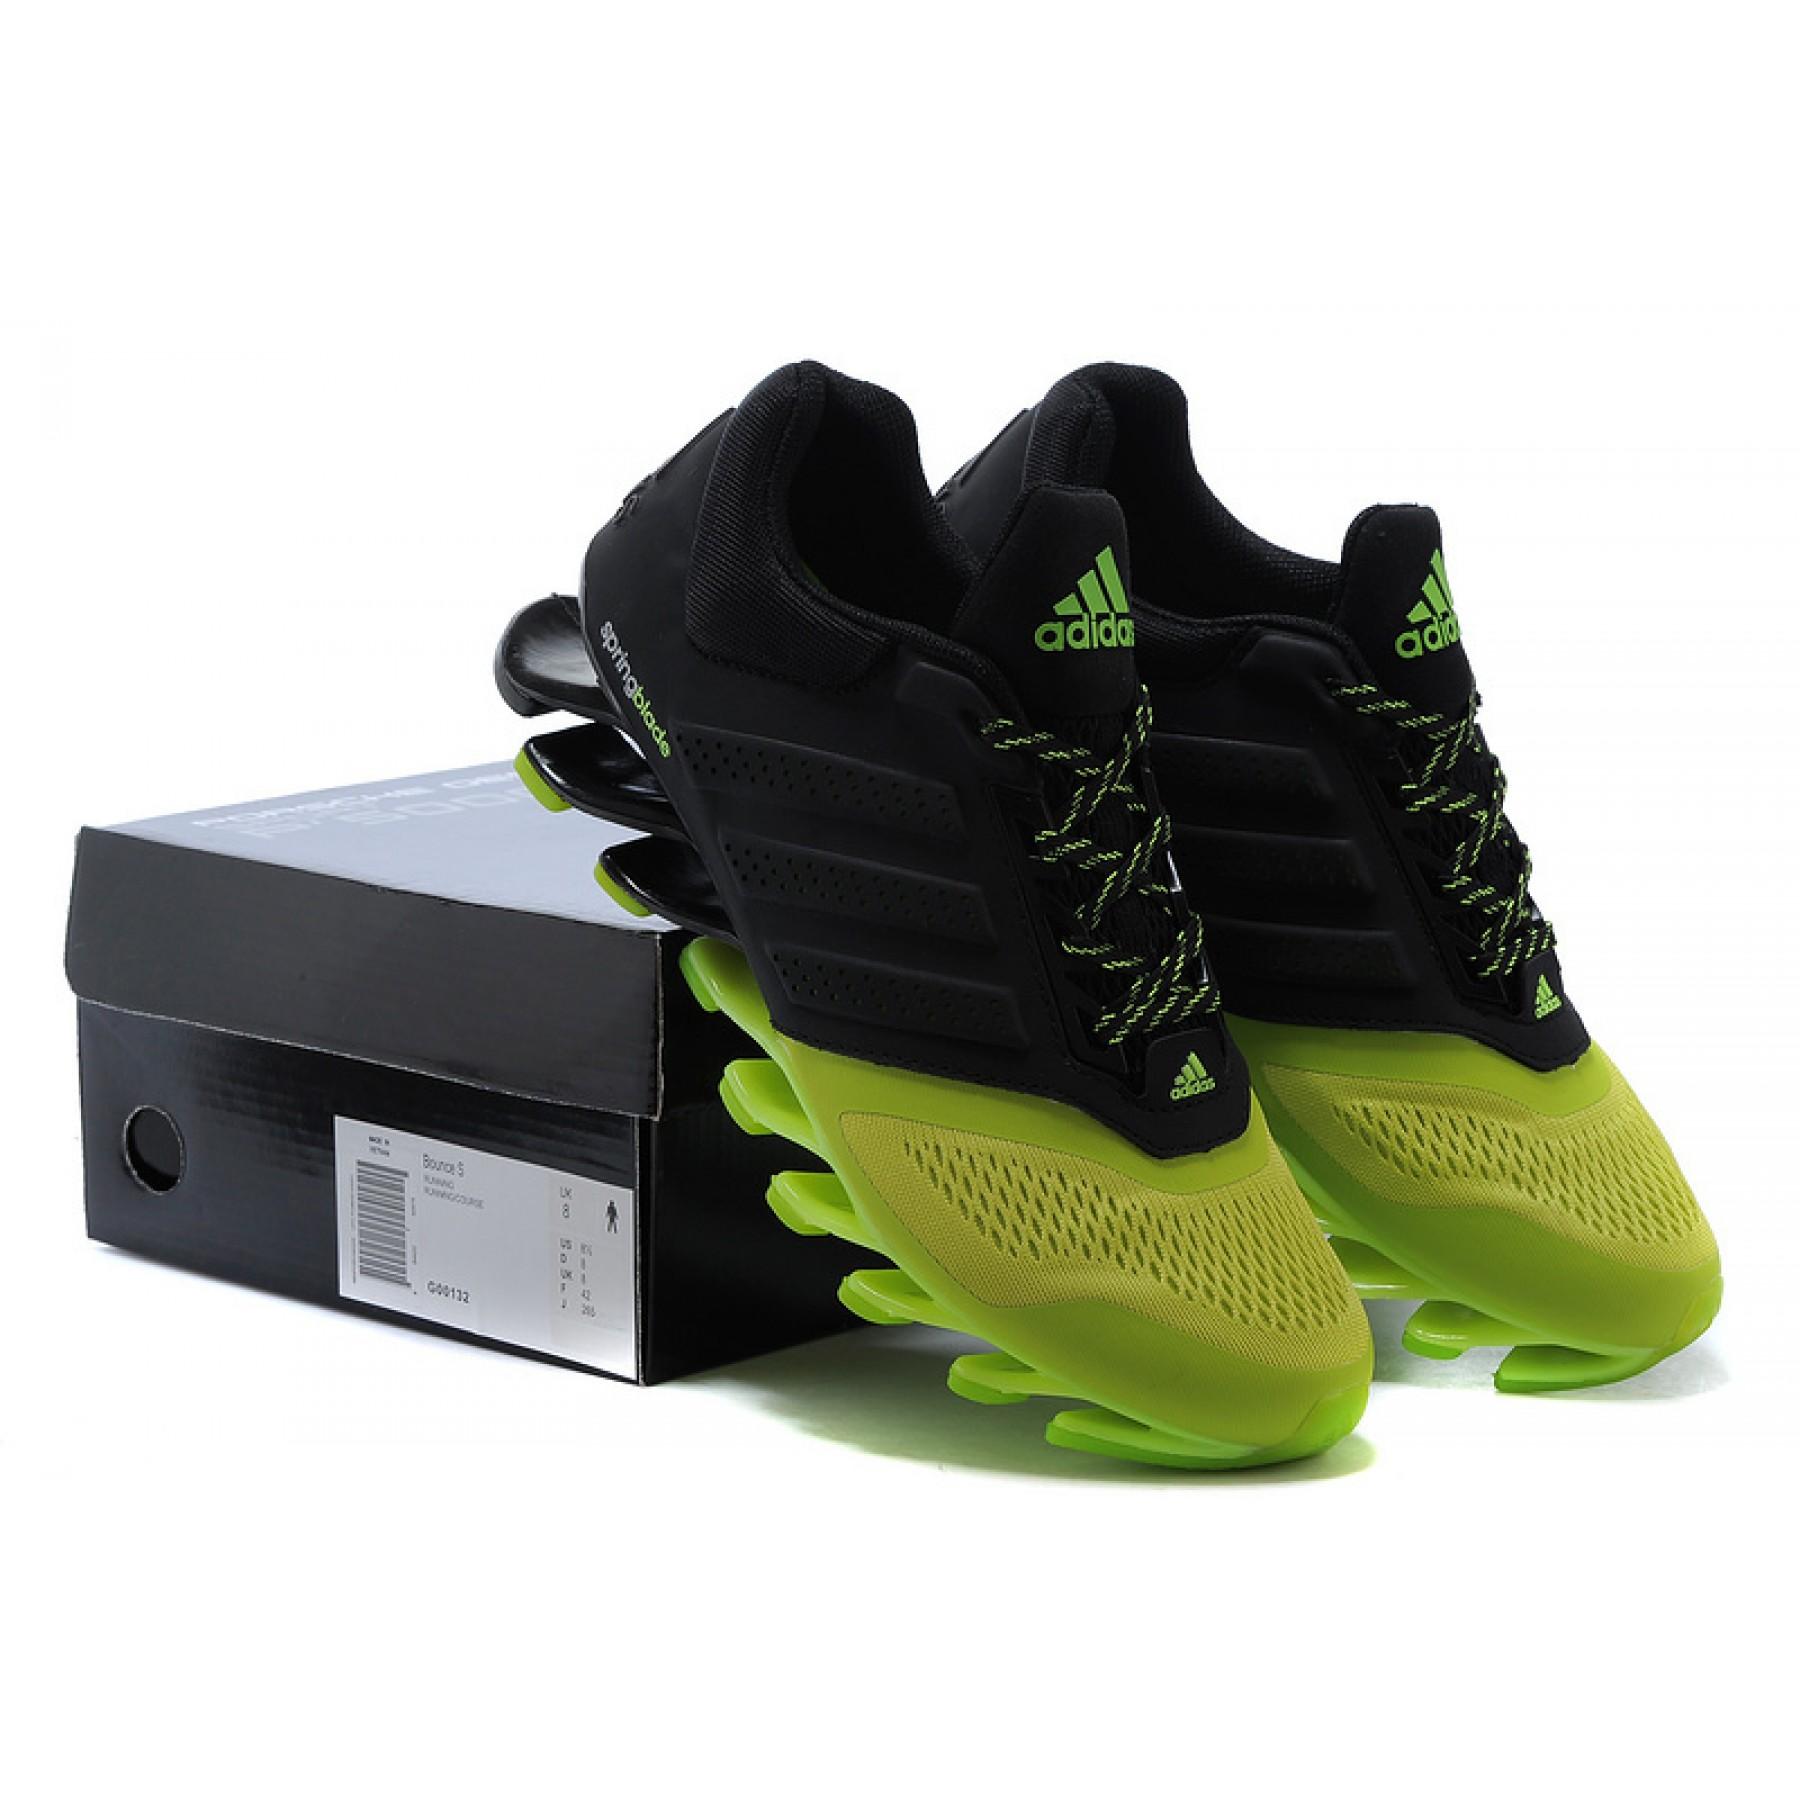 adidas drive verde e preto